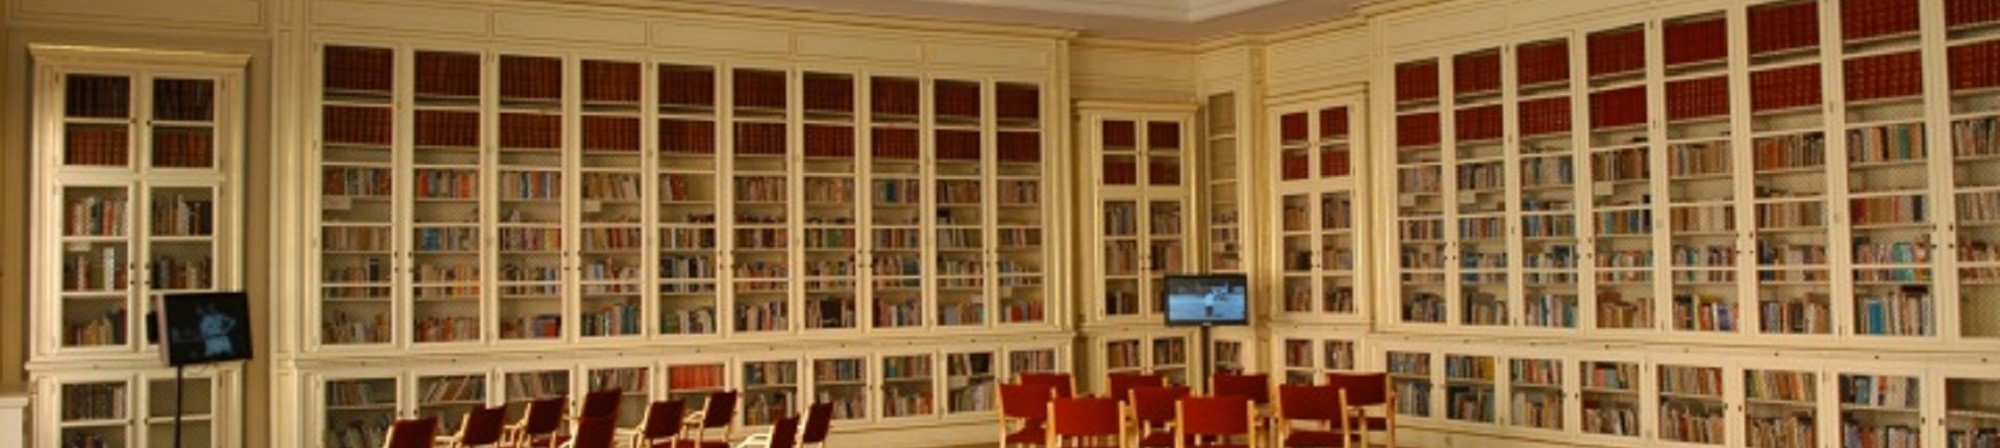 Biblioteca Nacional do Desporto